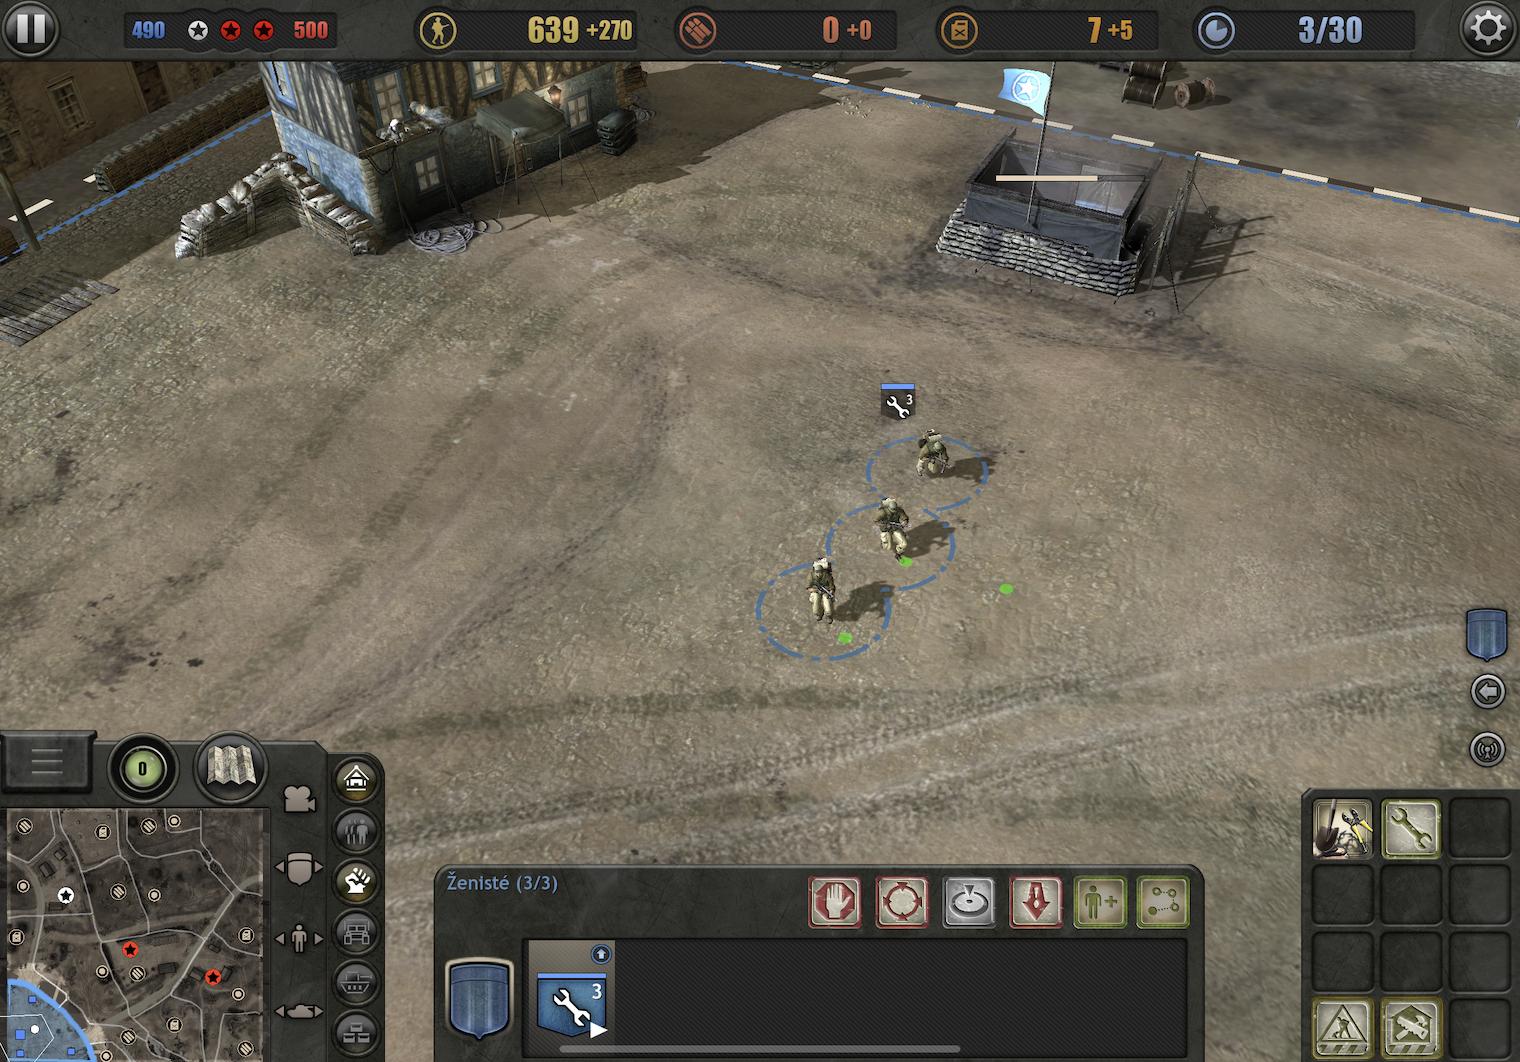 Recenze Company Of Heroes Nejlepsi Strategie Hra Na Ipad Je Tu